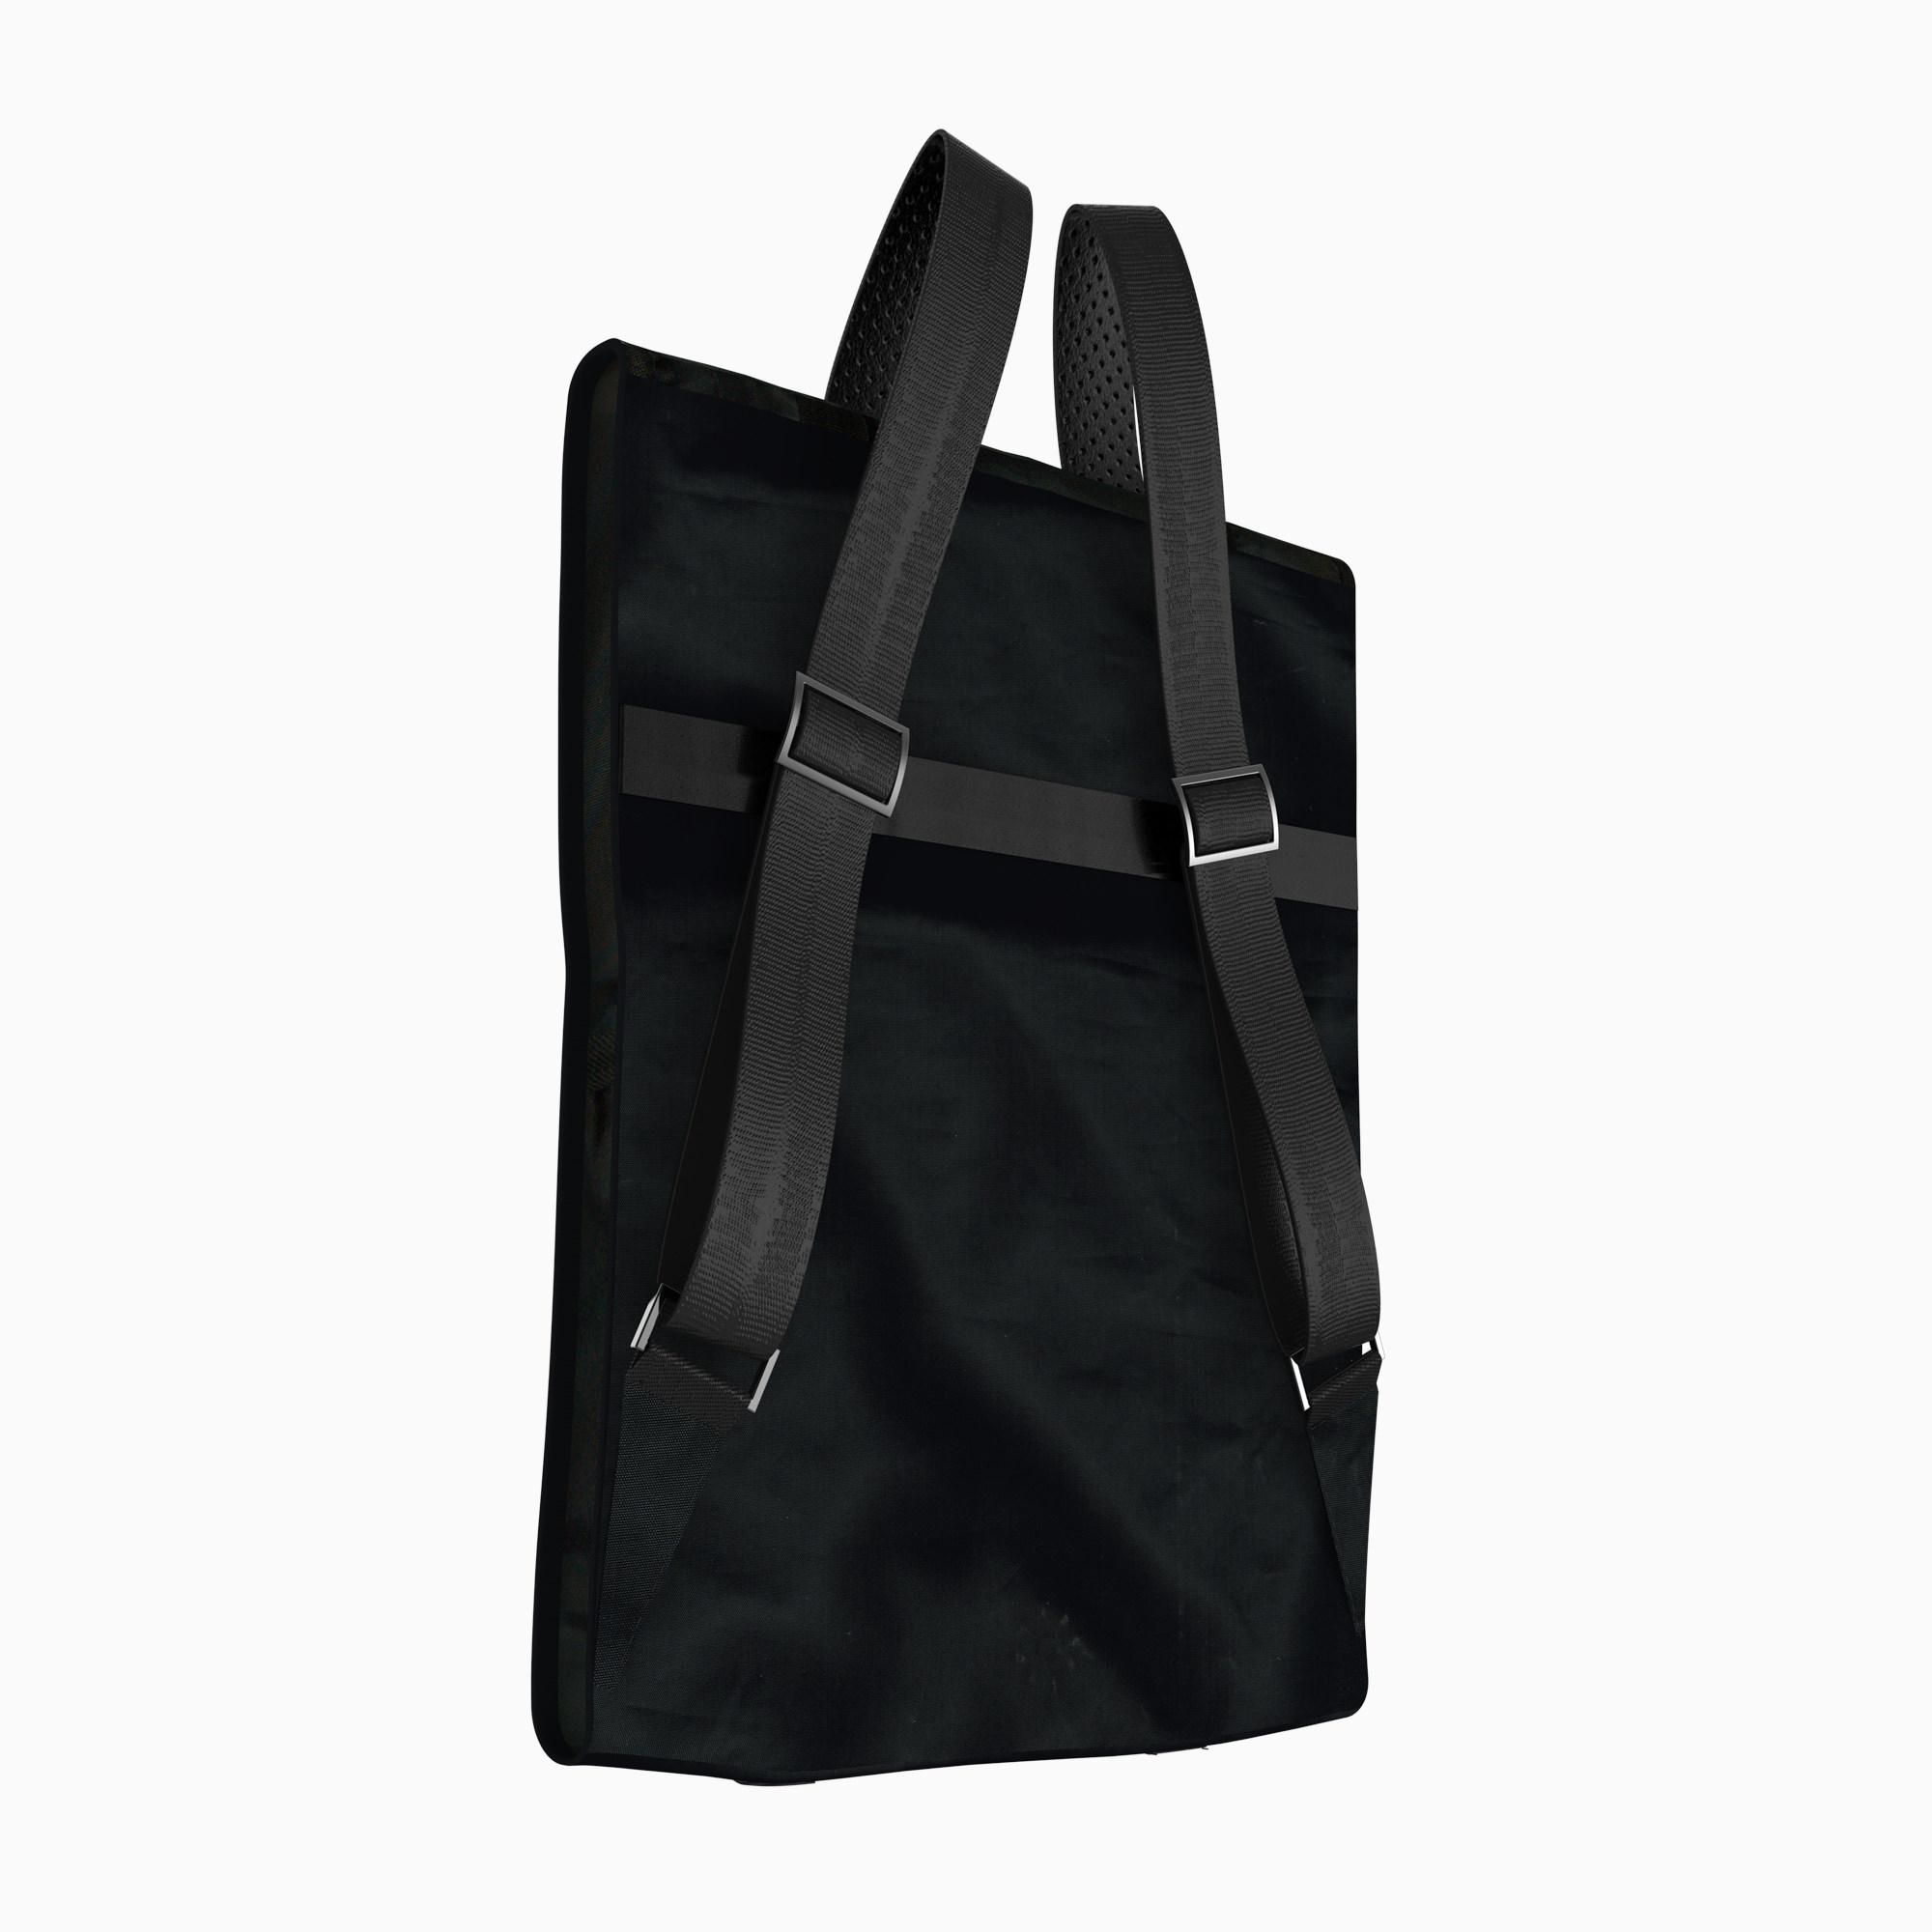 Ultra-thin backpack